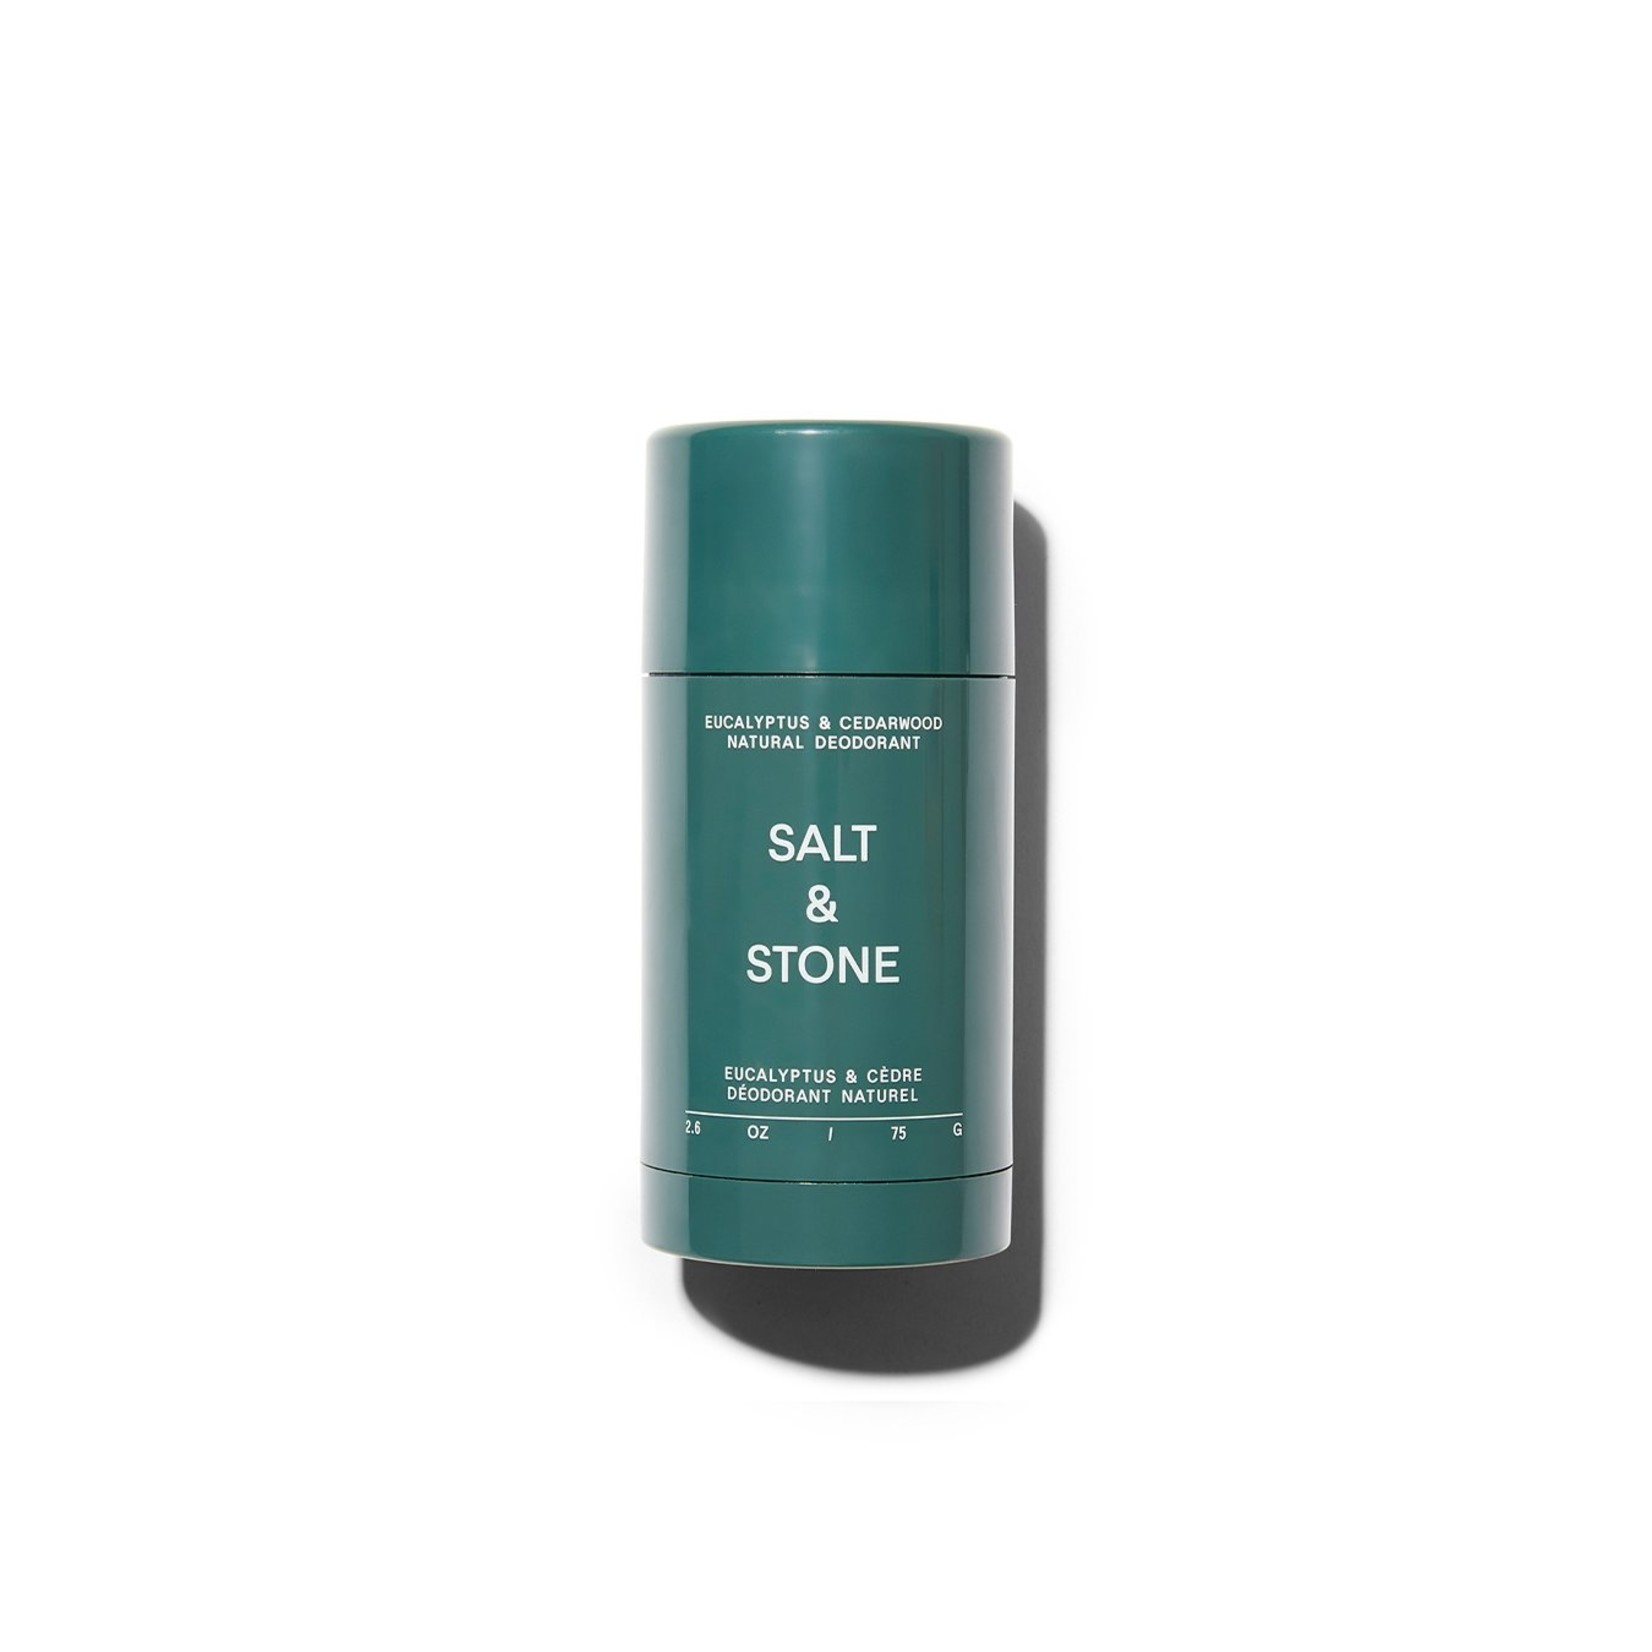 SALT & STONE DEODORANT EUCALYPTUS & CEDARWOOD - NATURAL DEODORANT